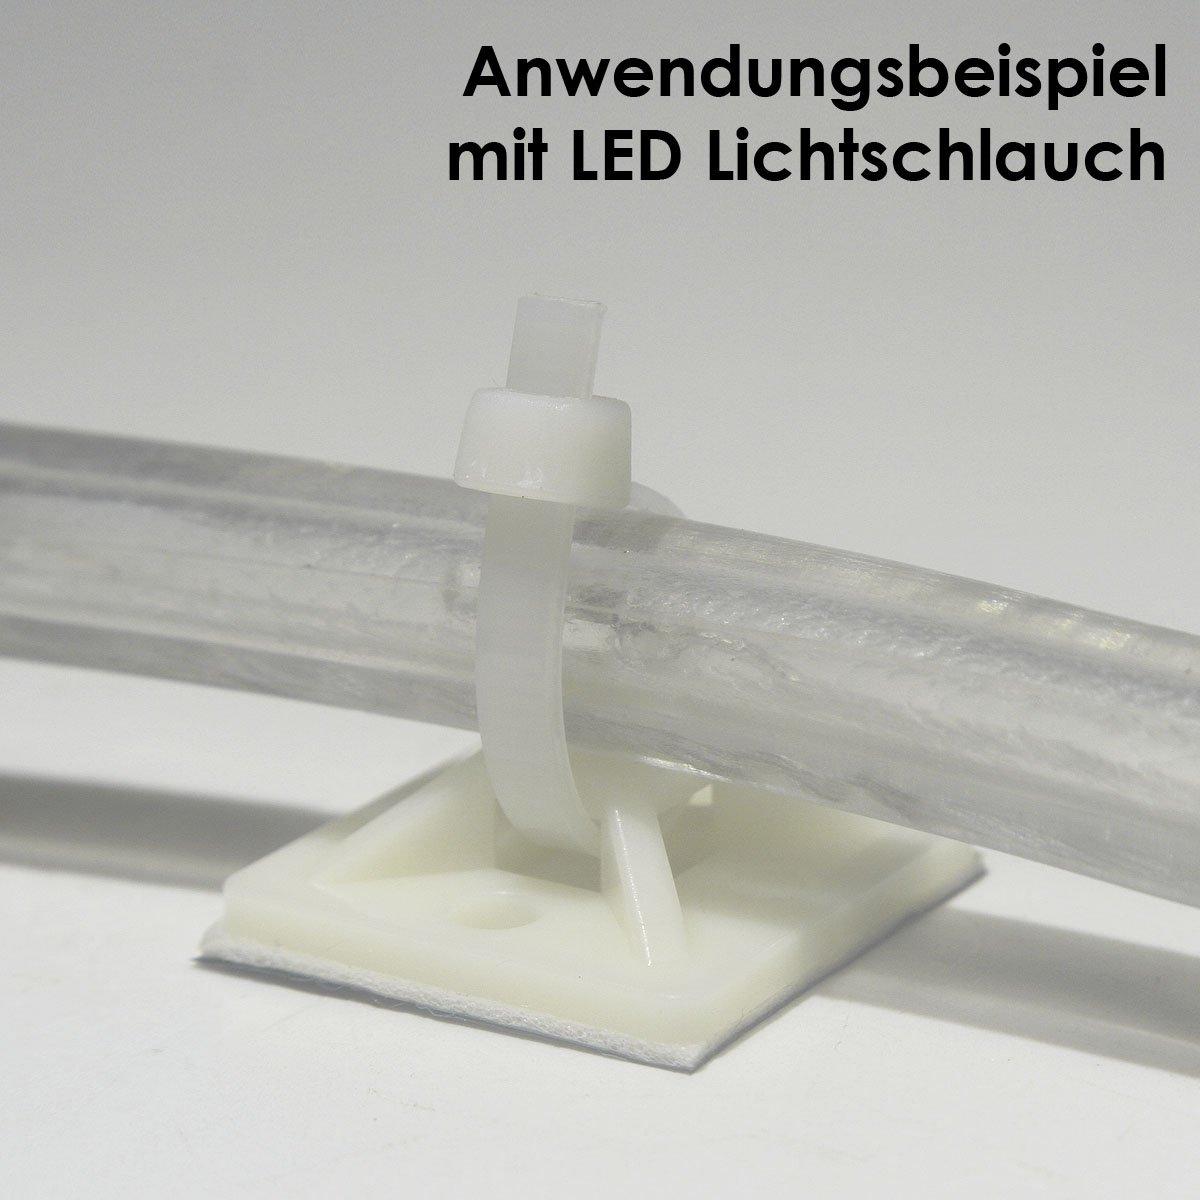 Kabelbinderhalterungen selbstklebende Kabelbinderaufnahme Kabelbinderbefestigung